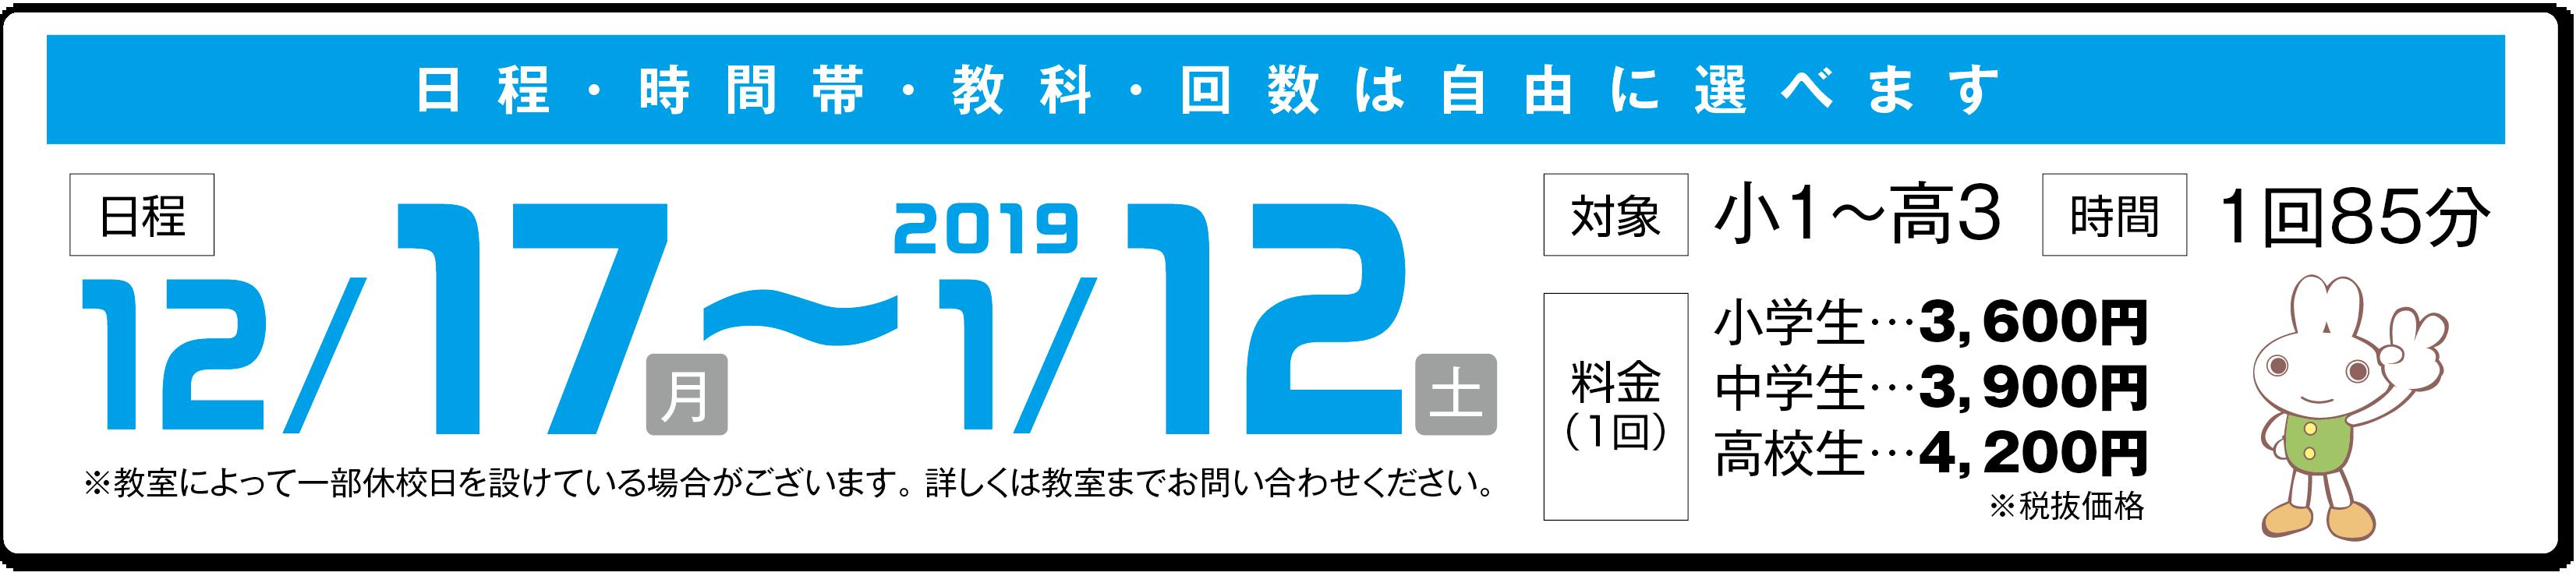 2018_kobetsu_winter_main.png